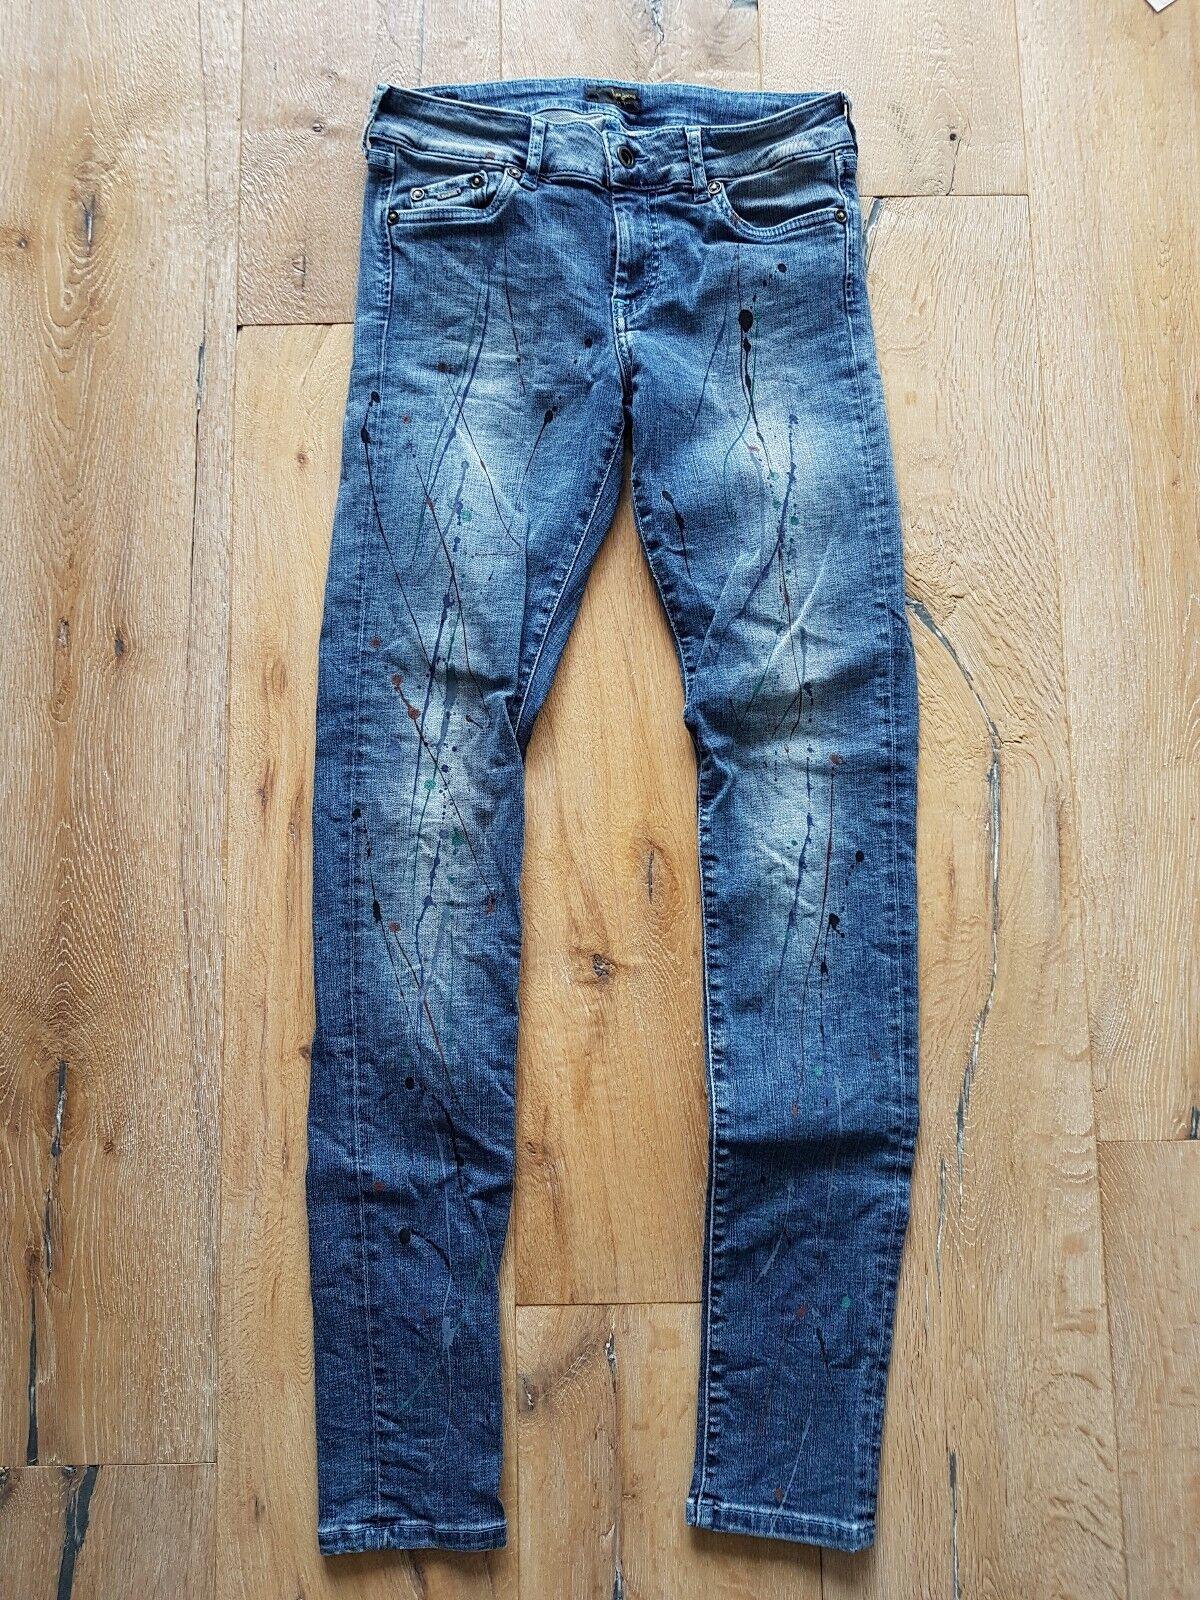 Pepe Jeans Pixi Panit Wie Neu  Jeans Hose Damen 27 28 skinny Jeans knöchellang